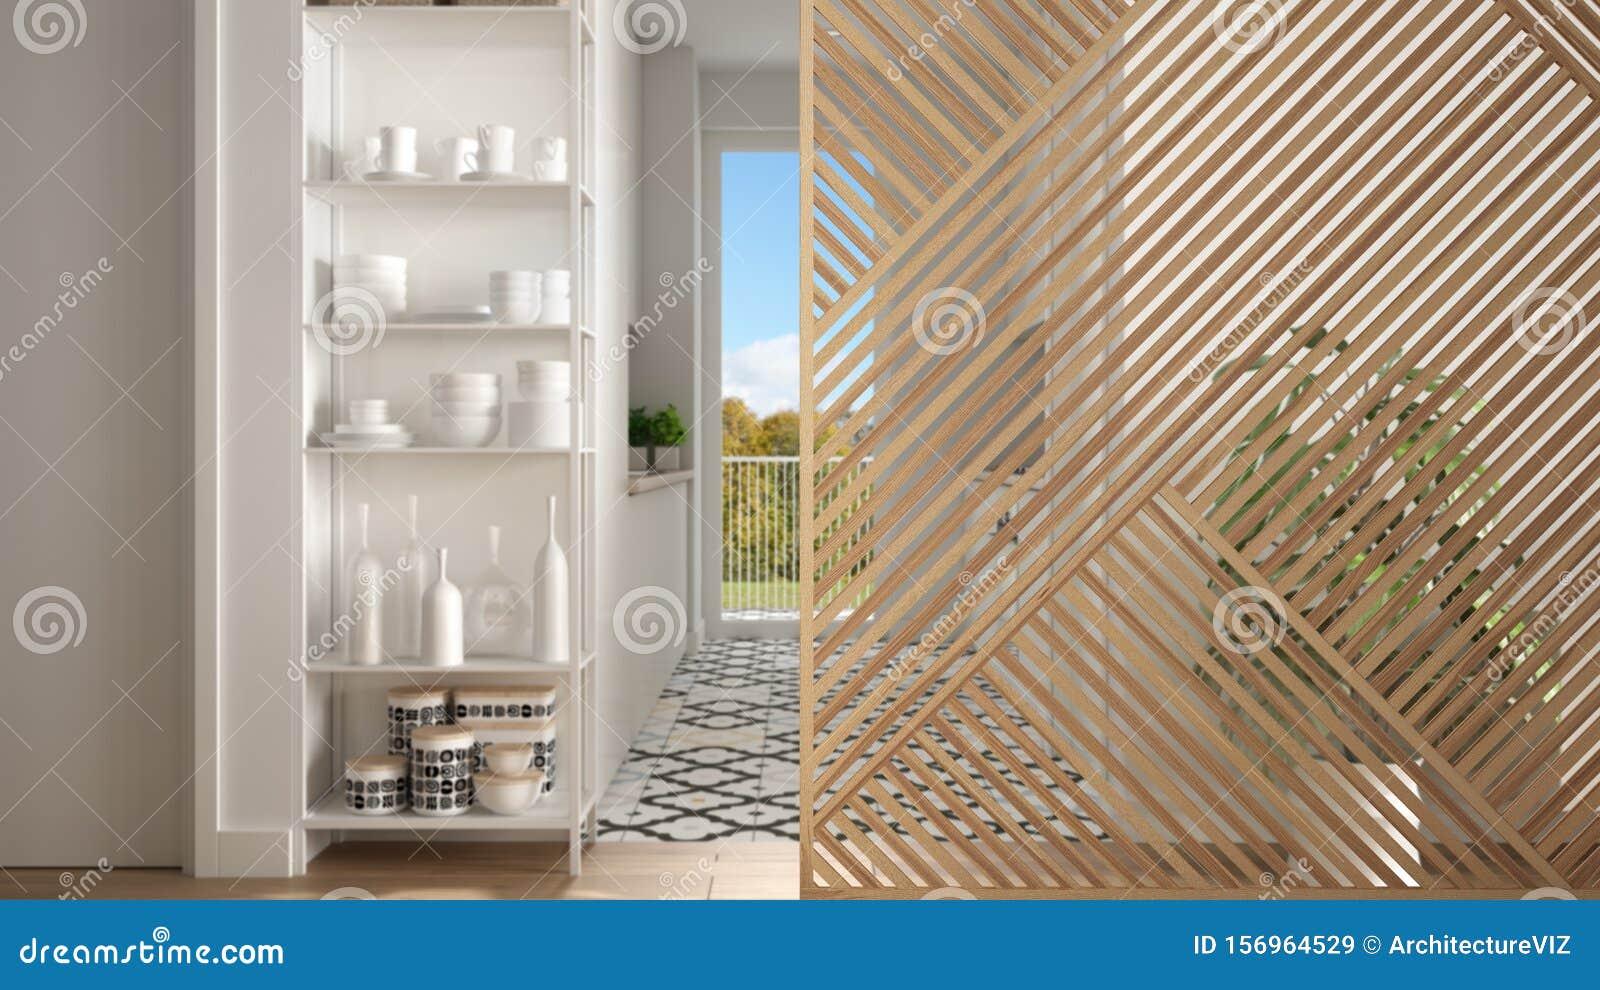 Wooden Panel Close Up Modern Kitchen With Big Window Parquet Floor Minimalist Zen Interior Design Concept Idea Contemporary Stock Image Image Of Apartment Panel 156964529